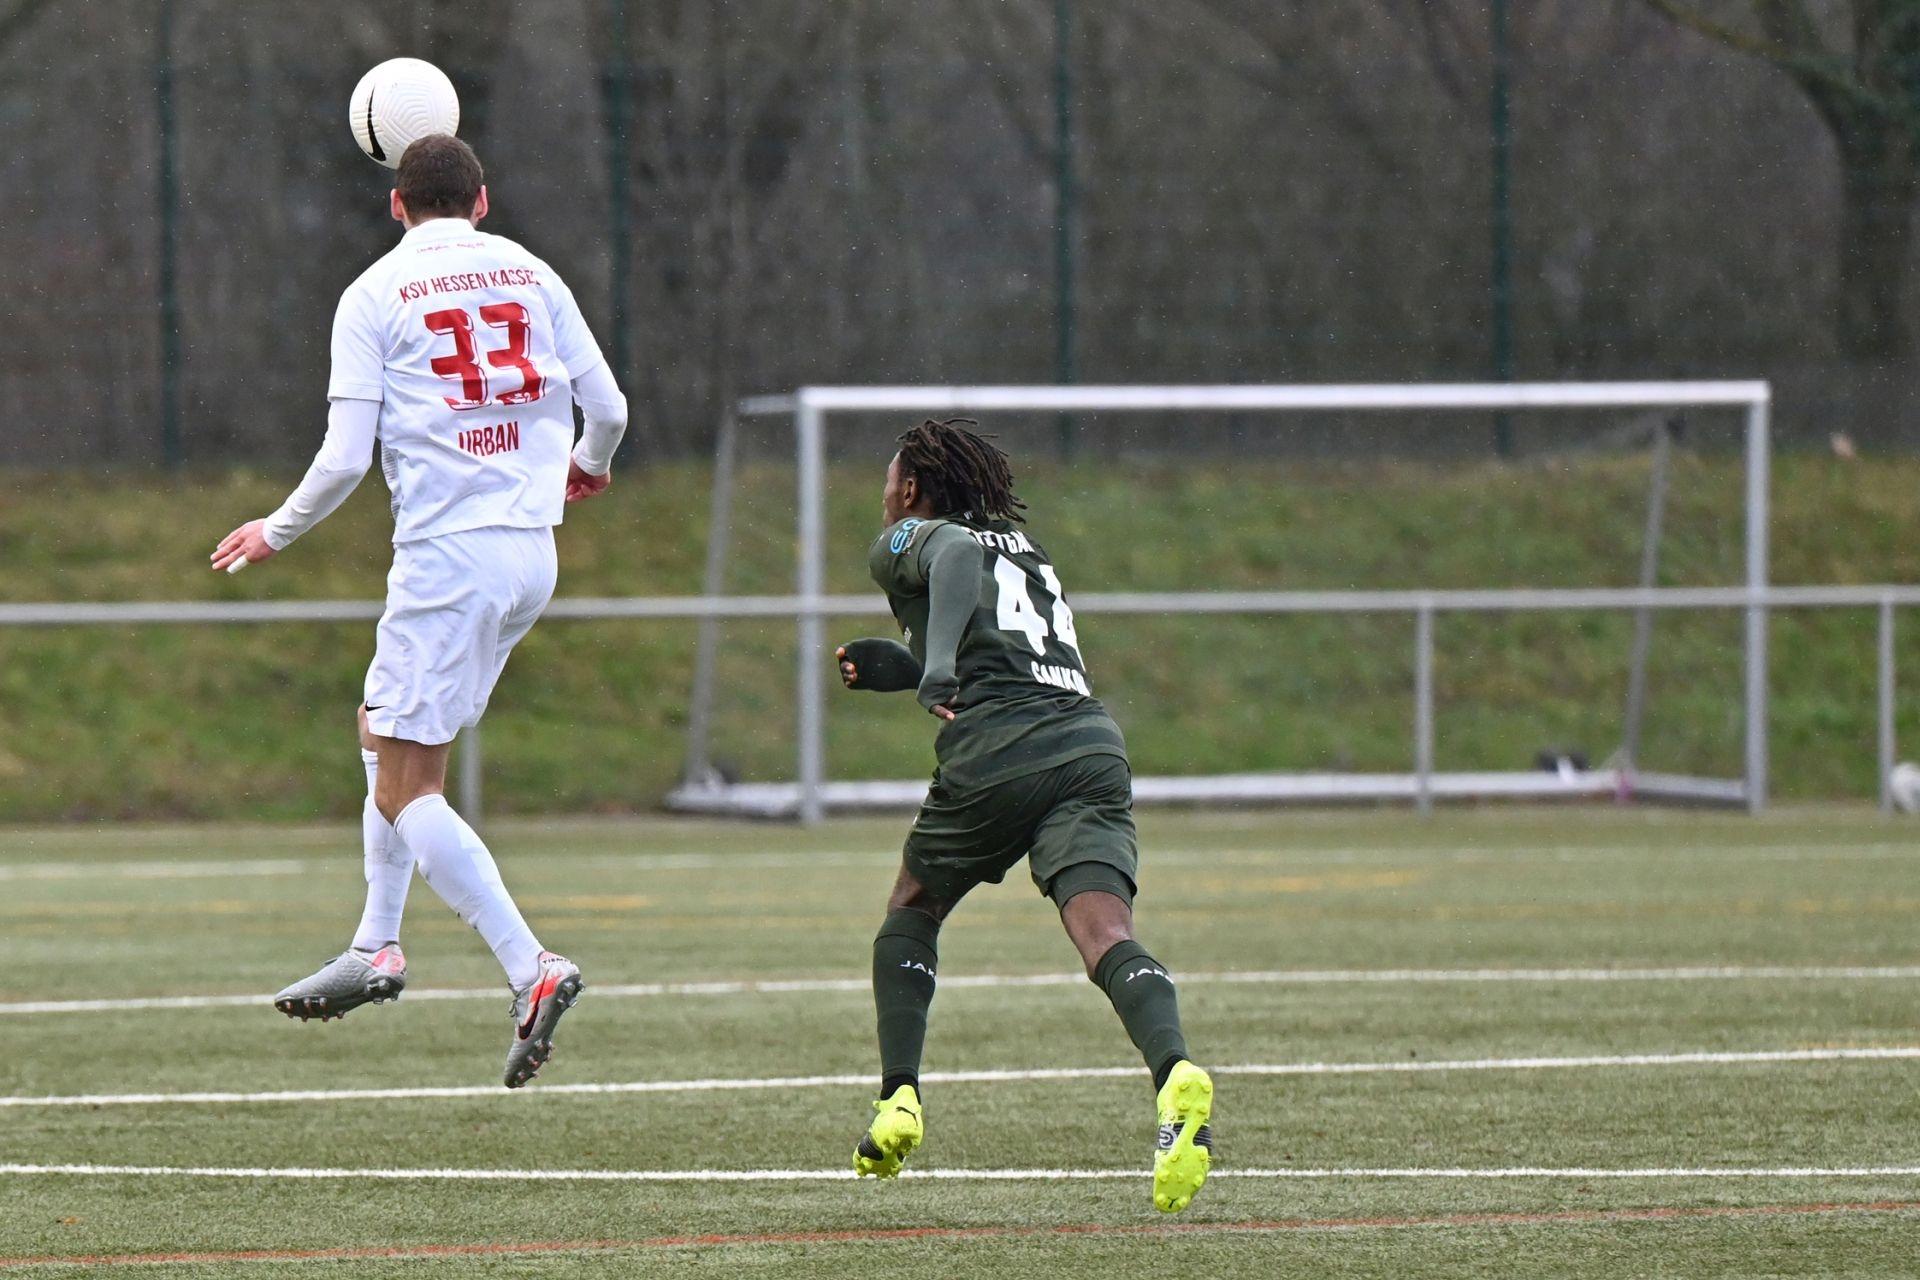 Regionalliga Südwest 2020/21, KSV Hessen Kassel, VfB Stuttgart II, Endstand 0:4, Robin Urban